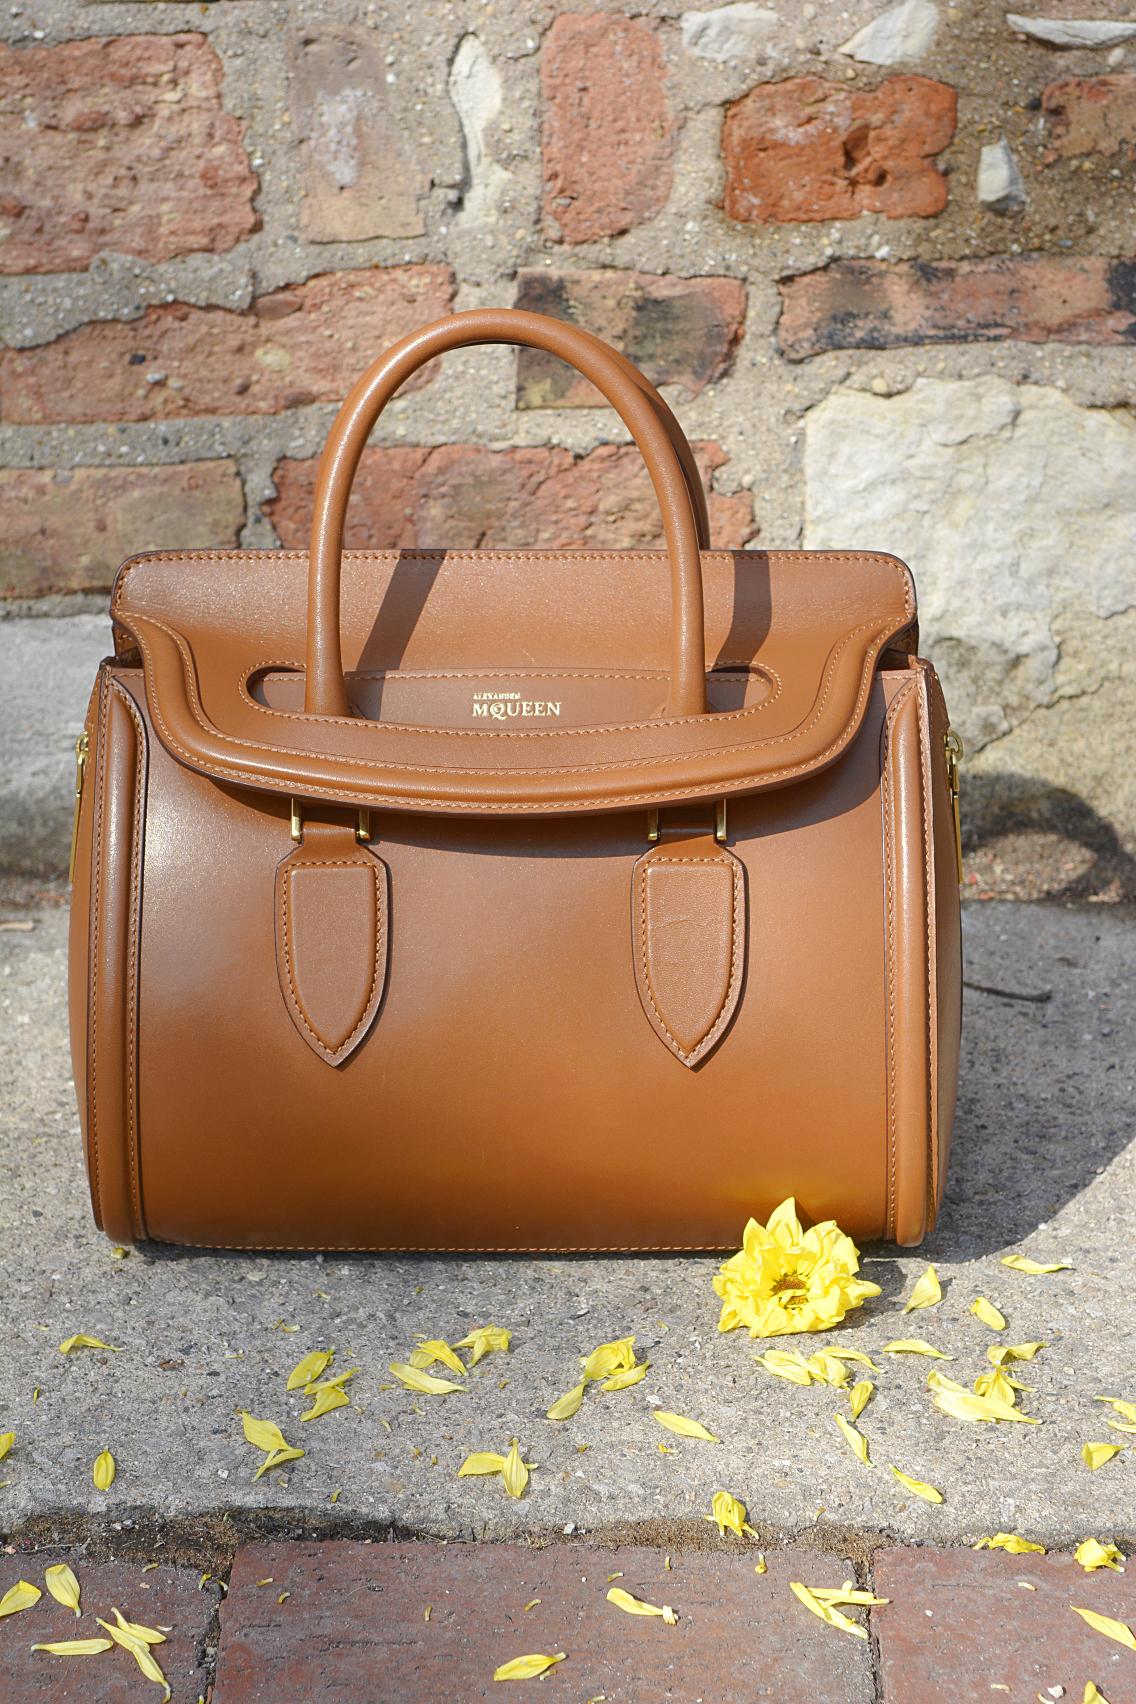 Alexander McQueen Small Heroine Bag Purse in Burnt Camel 4